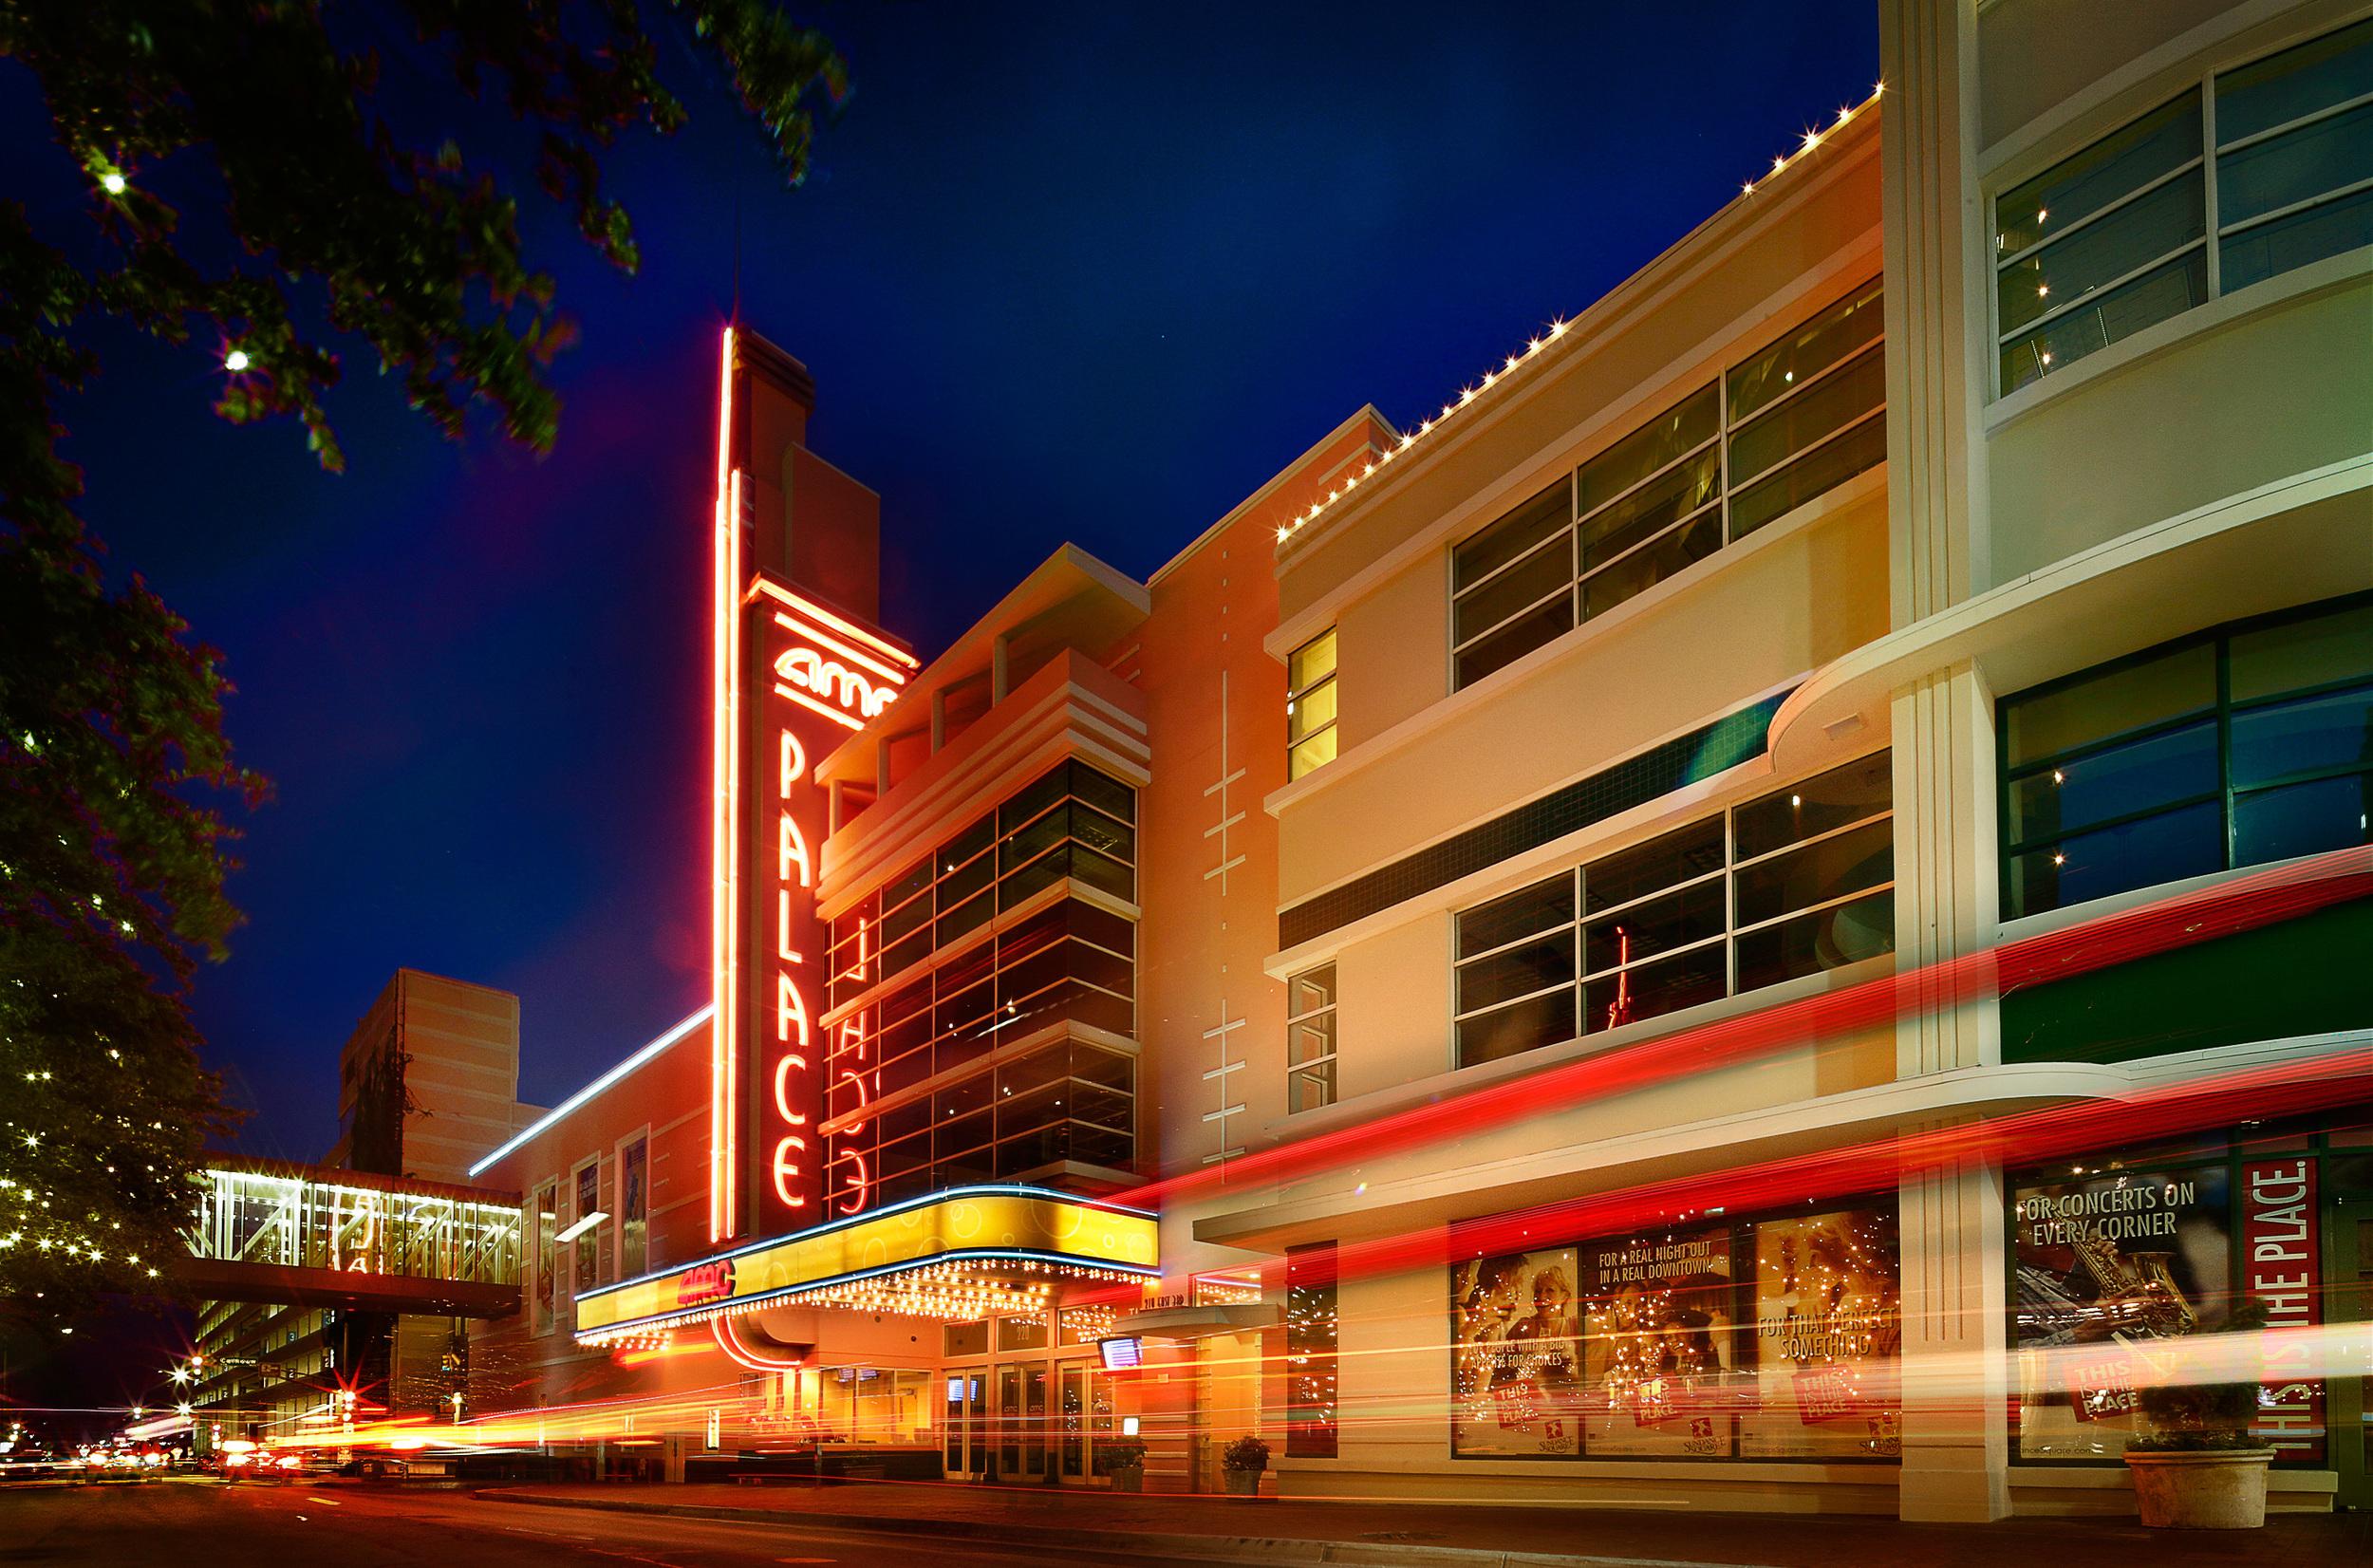 AMC Palace Theater